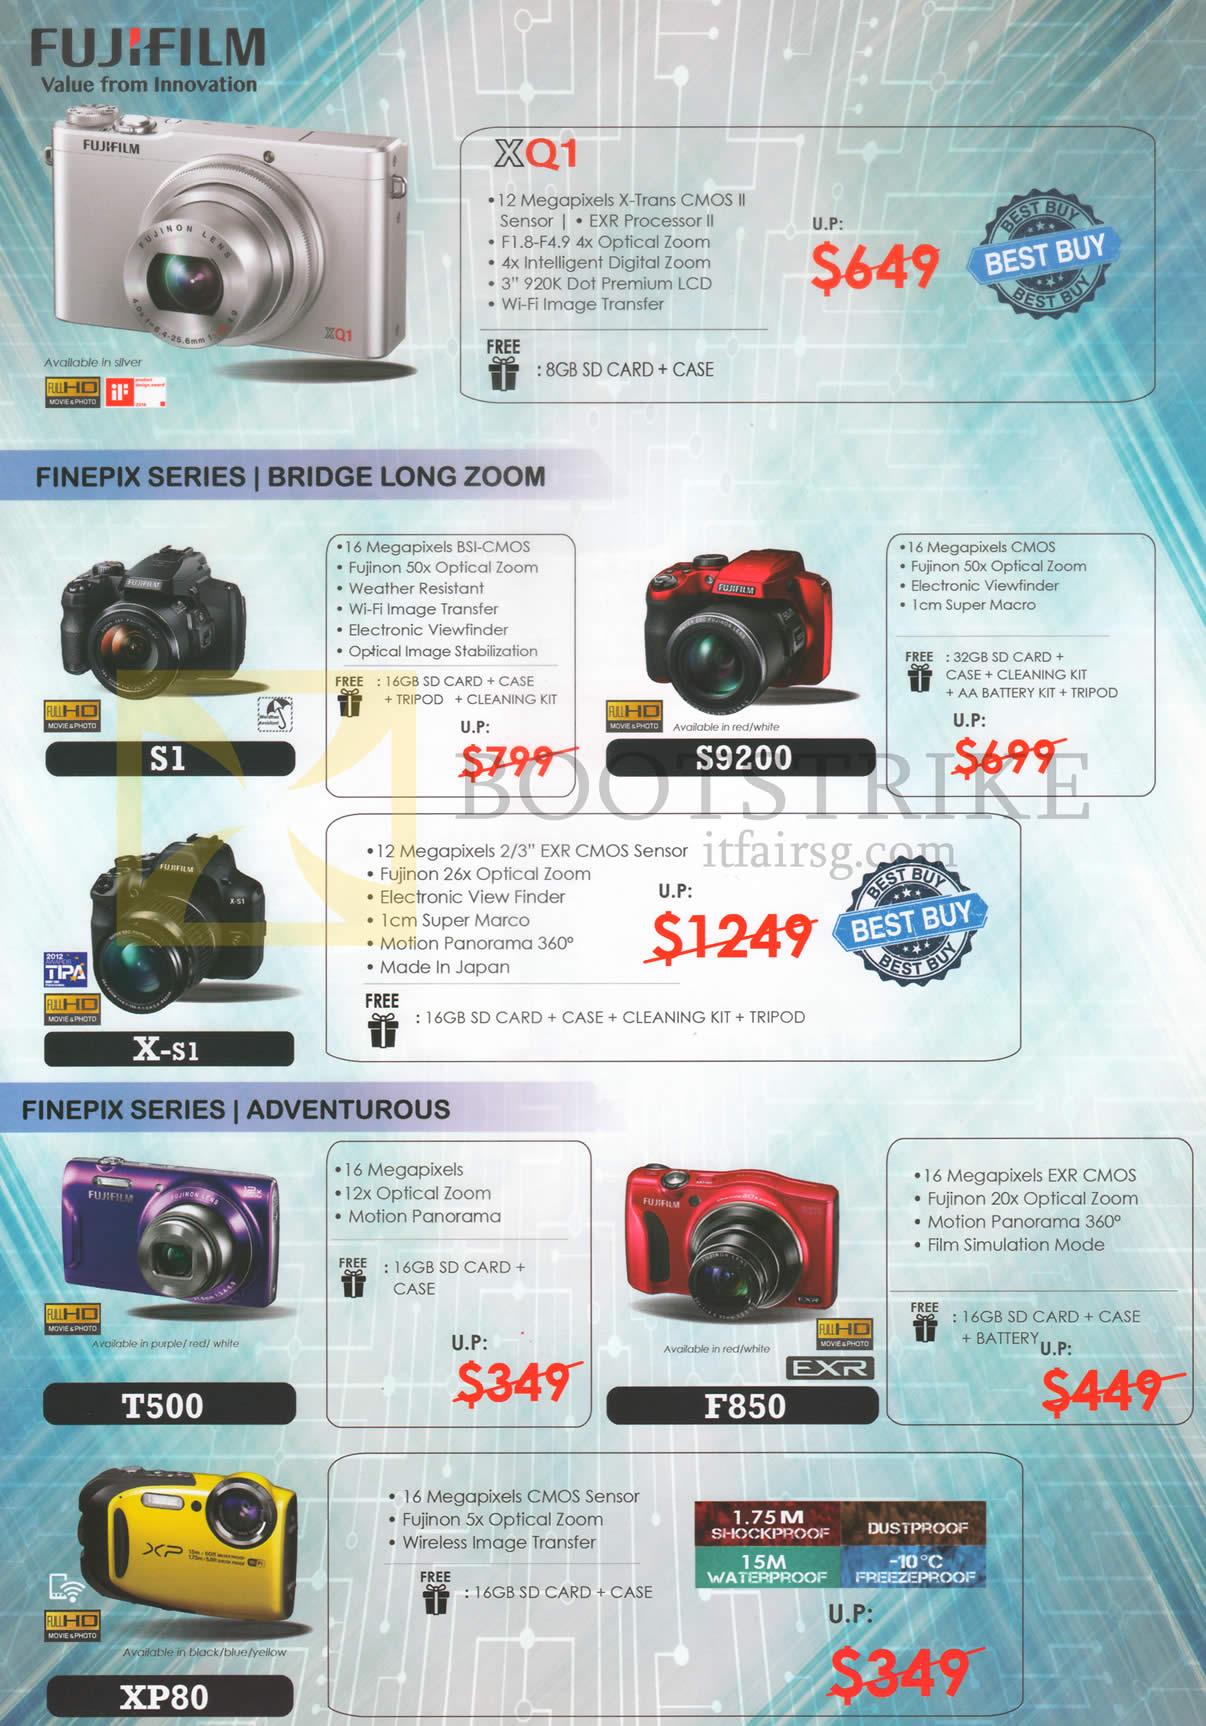 PC SHOW 2016 price list image brochure of Fujifilm Digital Cameras (No Prices) XQ1, S1, X-S1, S9200, T500, F850, XP80